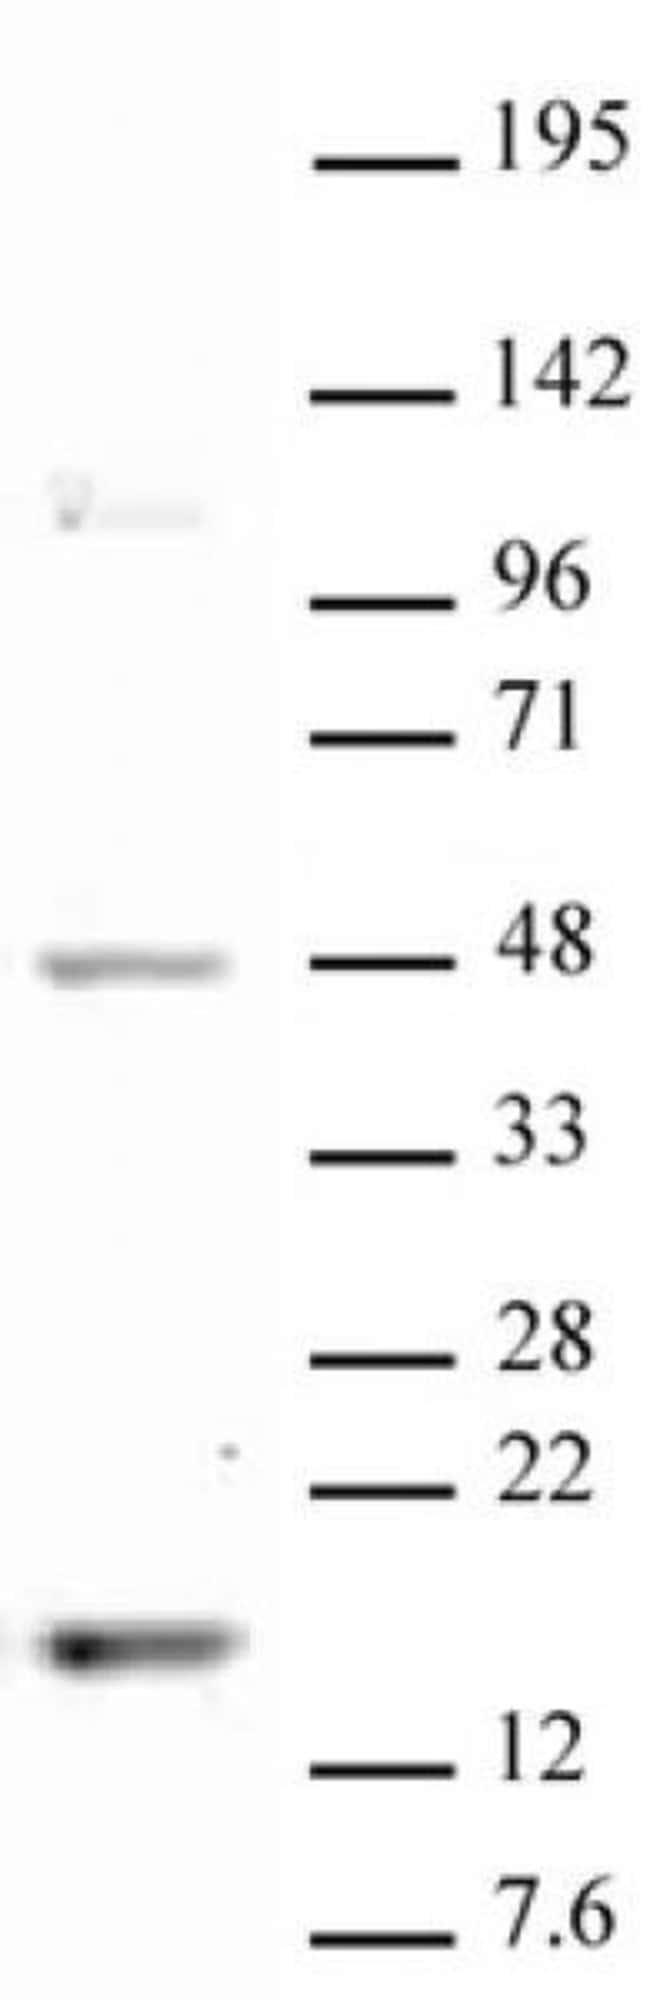 Histone H3K18me1 Rabbit anti-Human, Unconjugated, Polyclonal, Active Motif:Antibodies:Primary